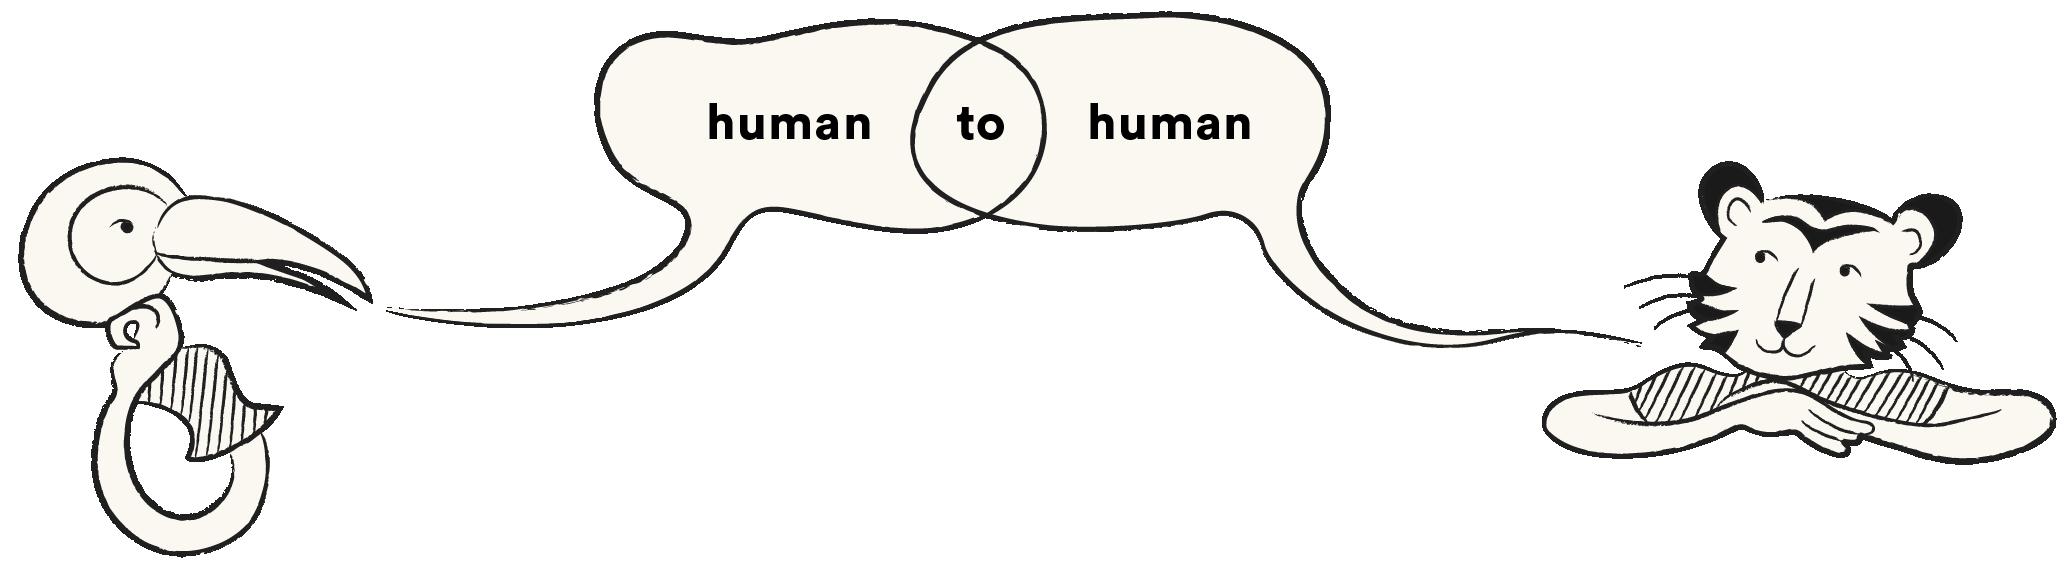 Literal Humans Illustration